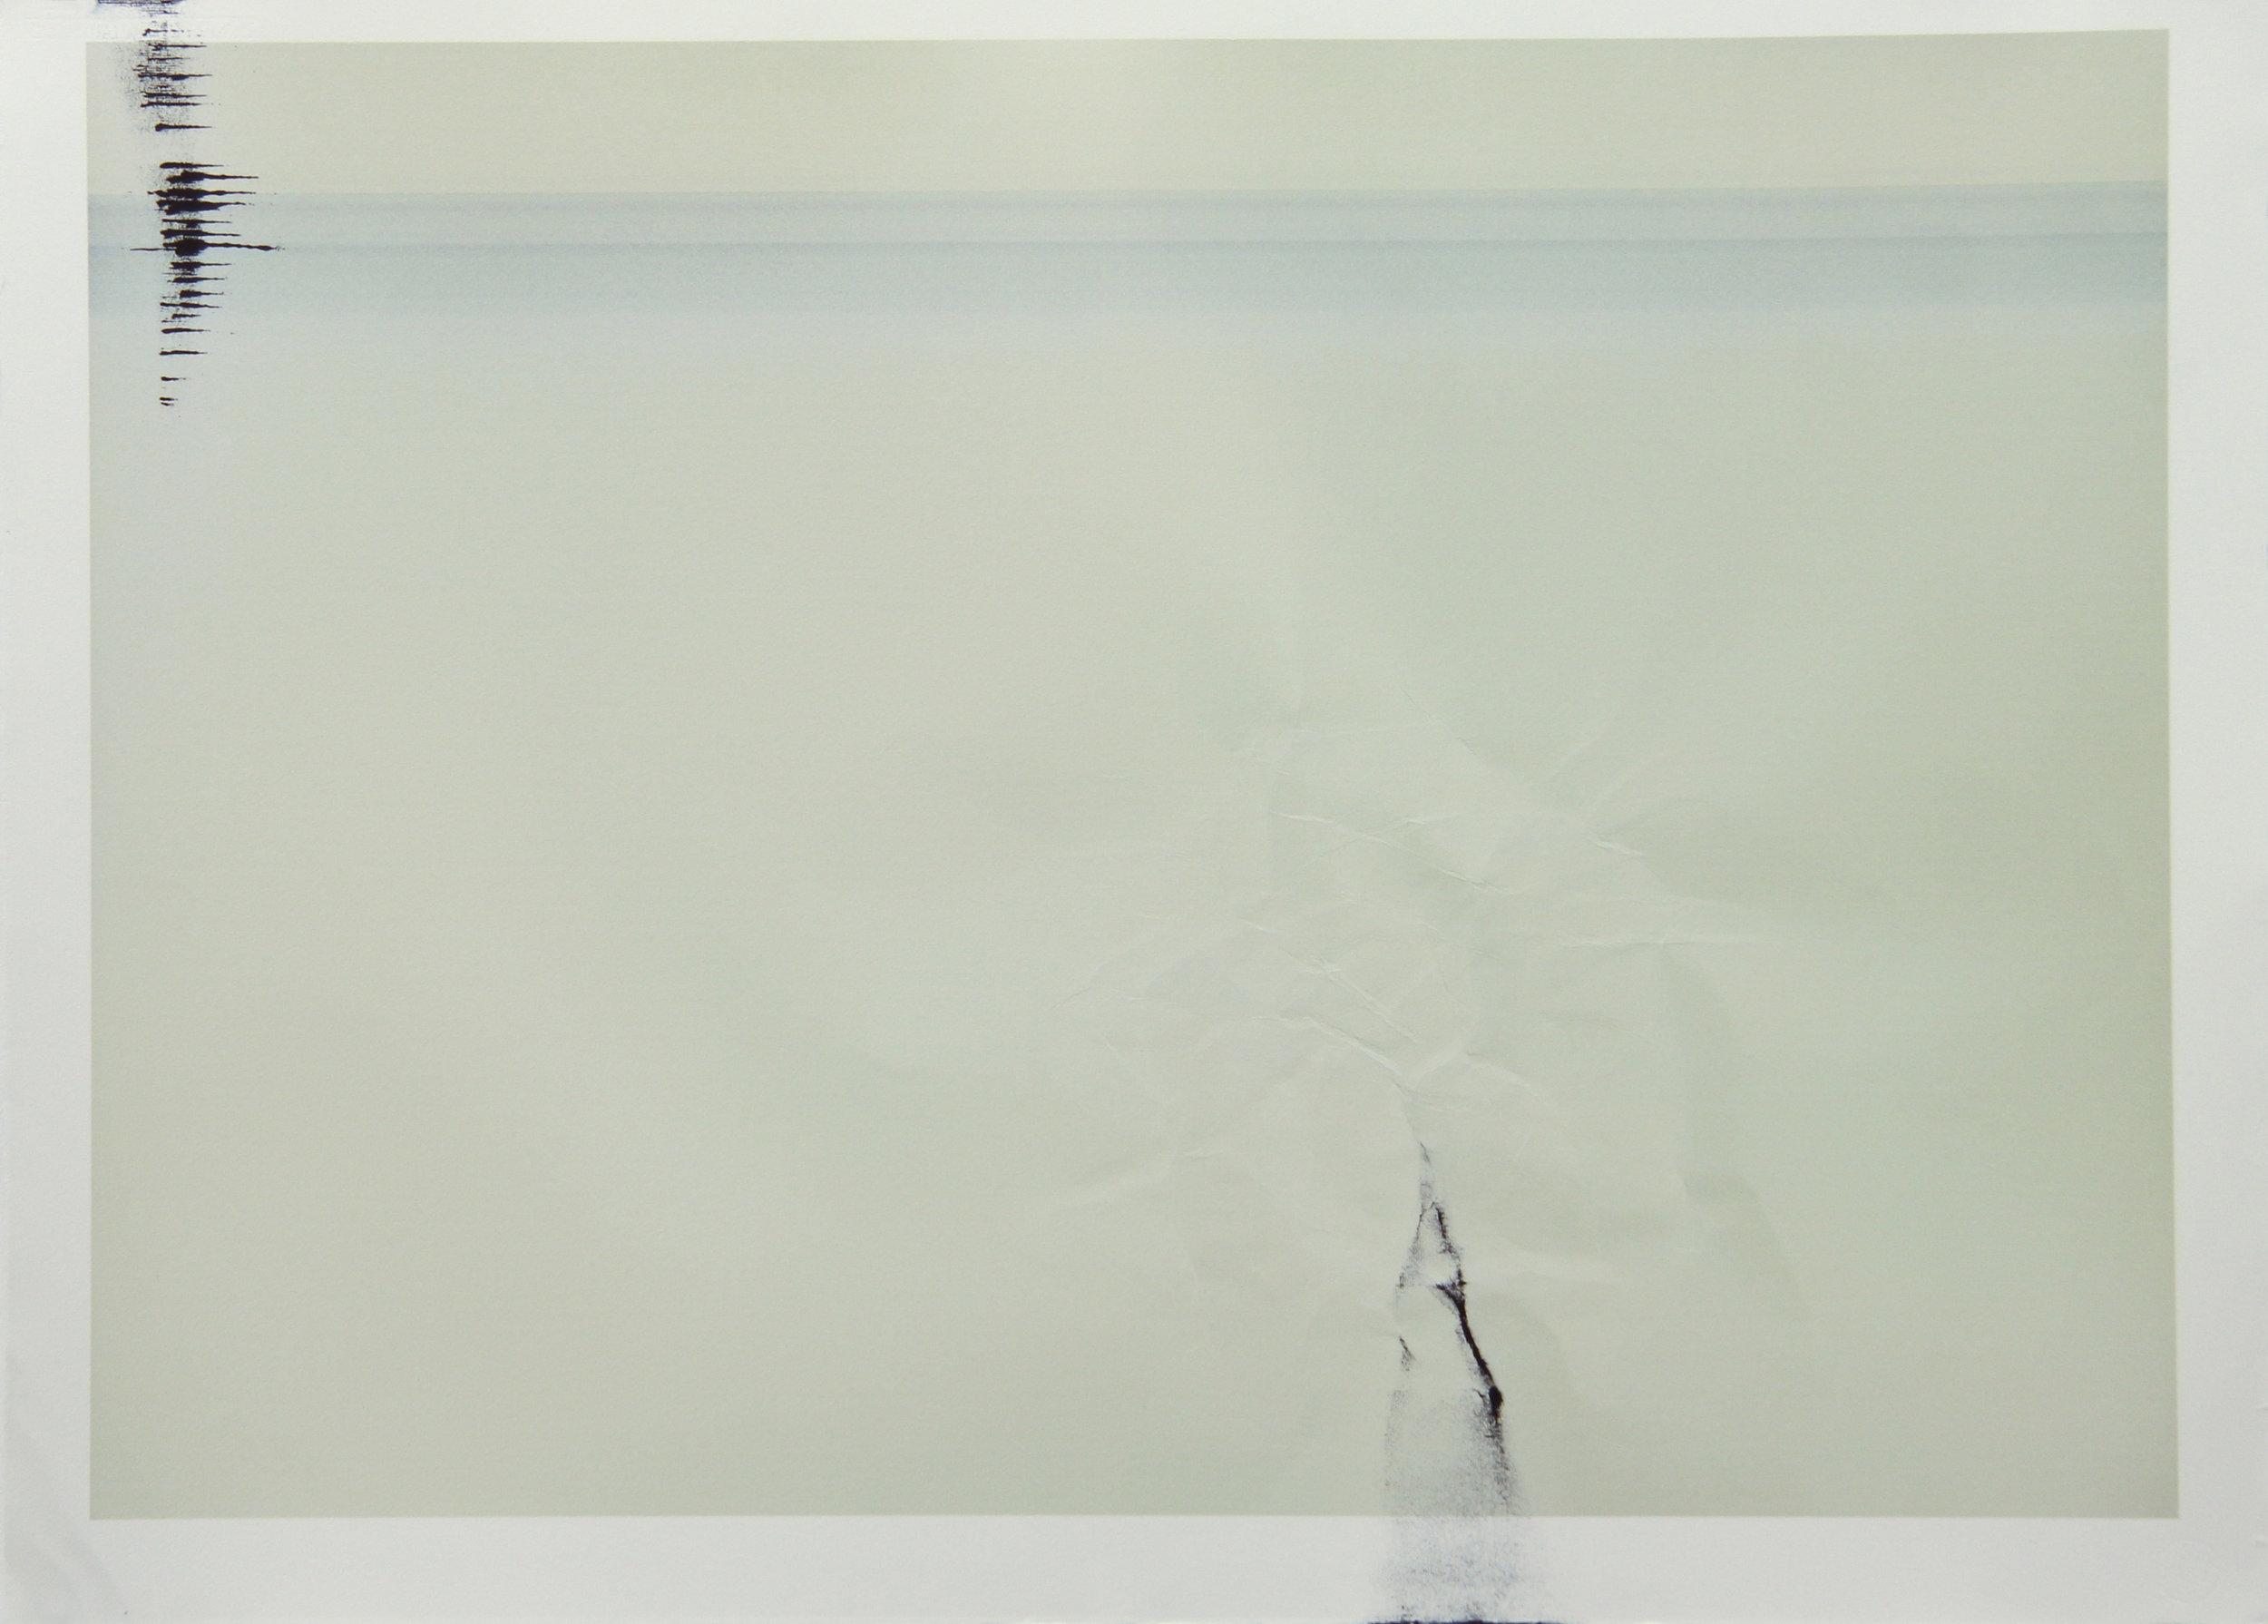 Tinted Headstrike #3, 2015 Unique giclée print, 107 x 78 cm